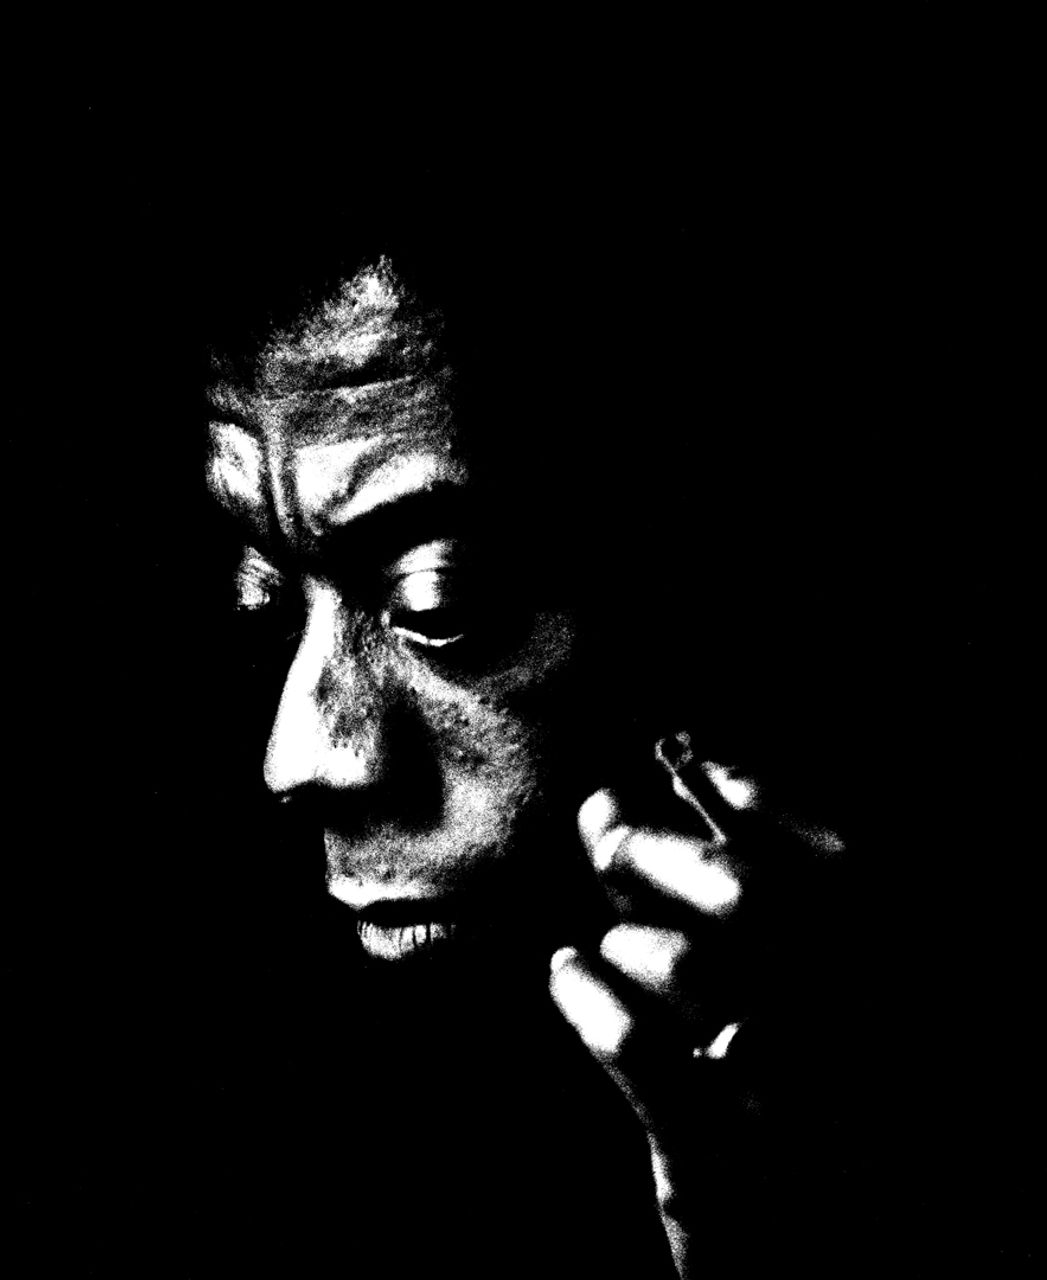 Maria Austria, The American writer James Baldwin, Amsterdam, 1965. Maria Austria Instituut, Amsterdam